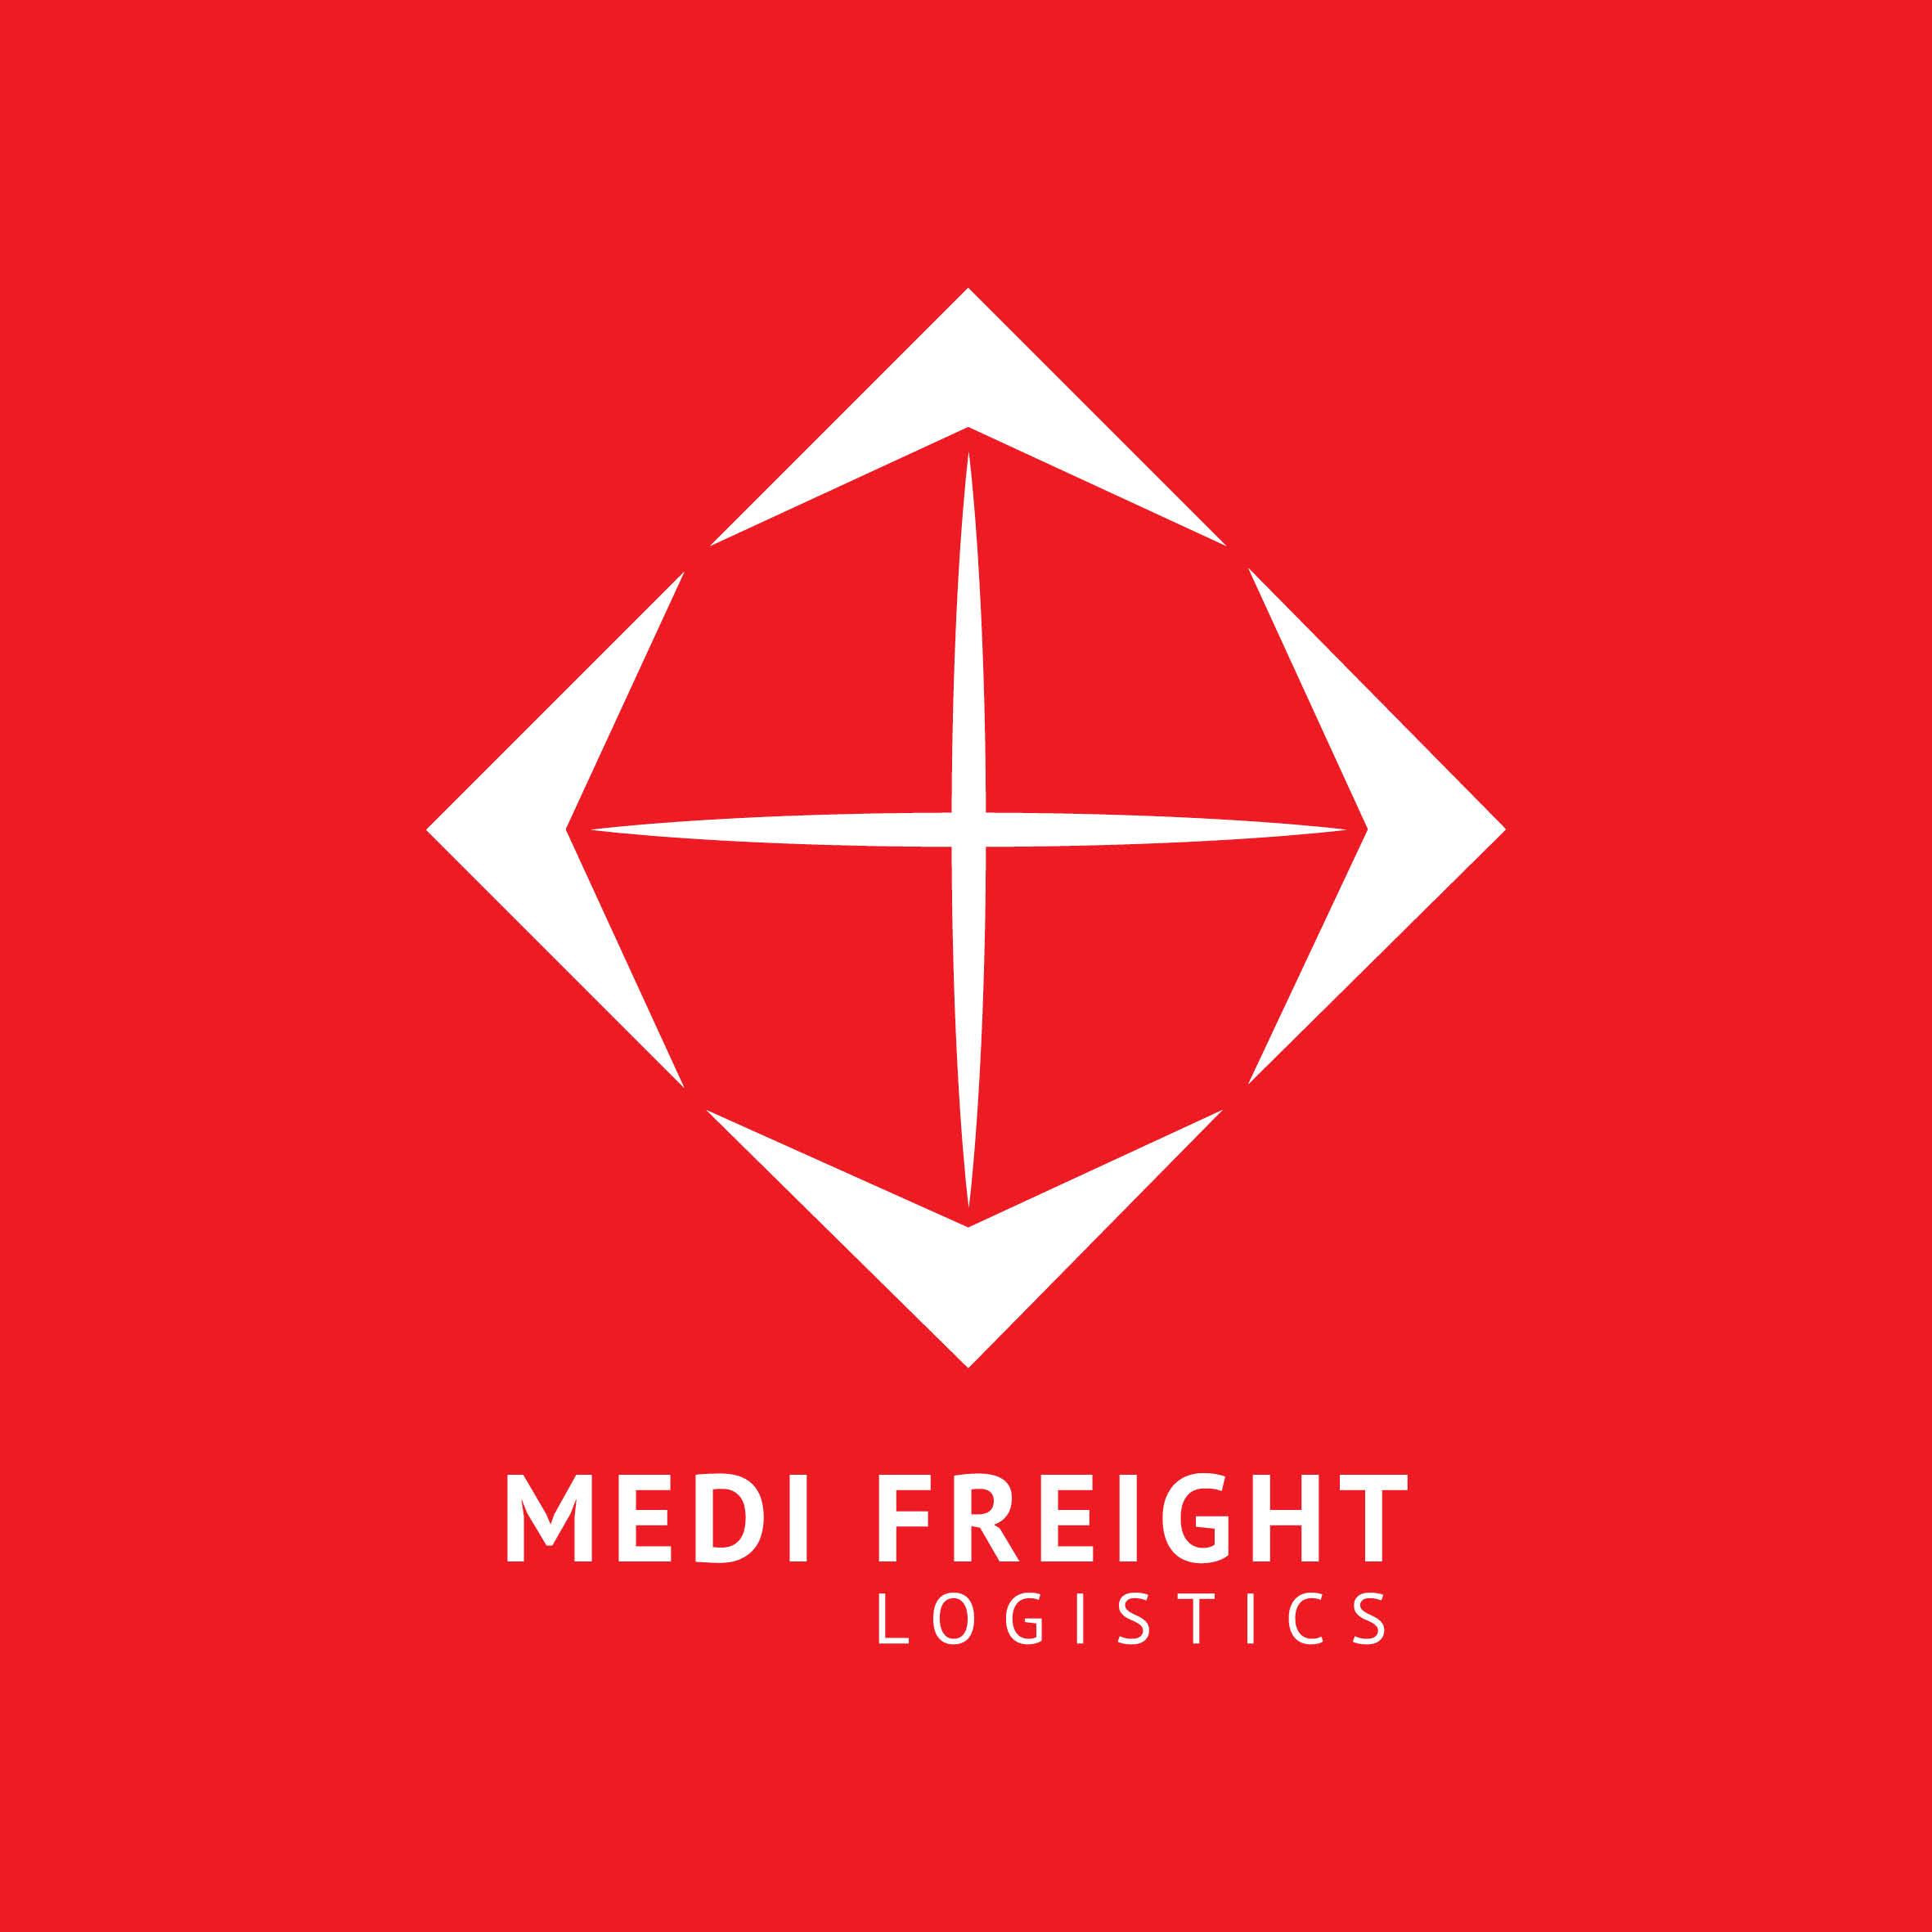 Client-logo-cover-medifreight-logistics.jpg